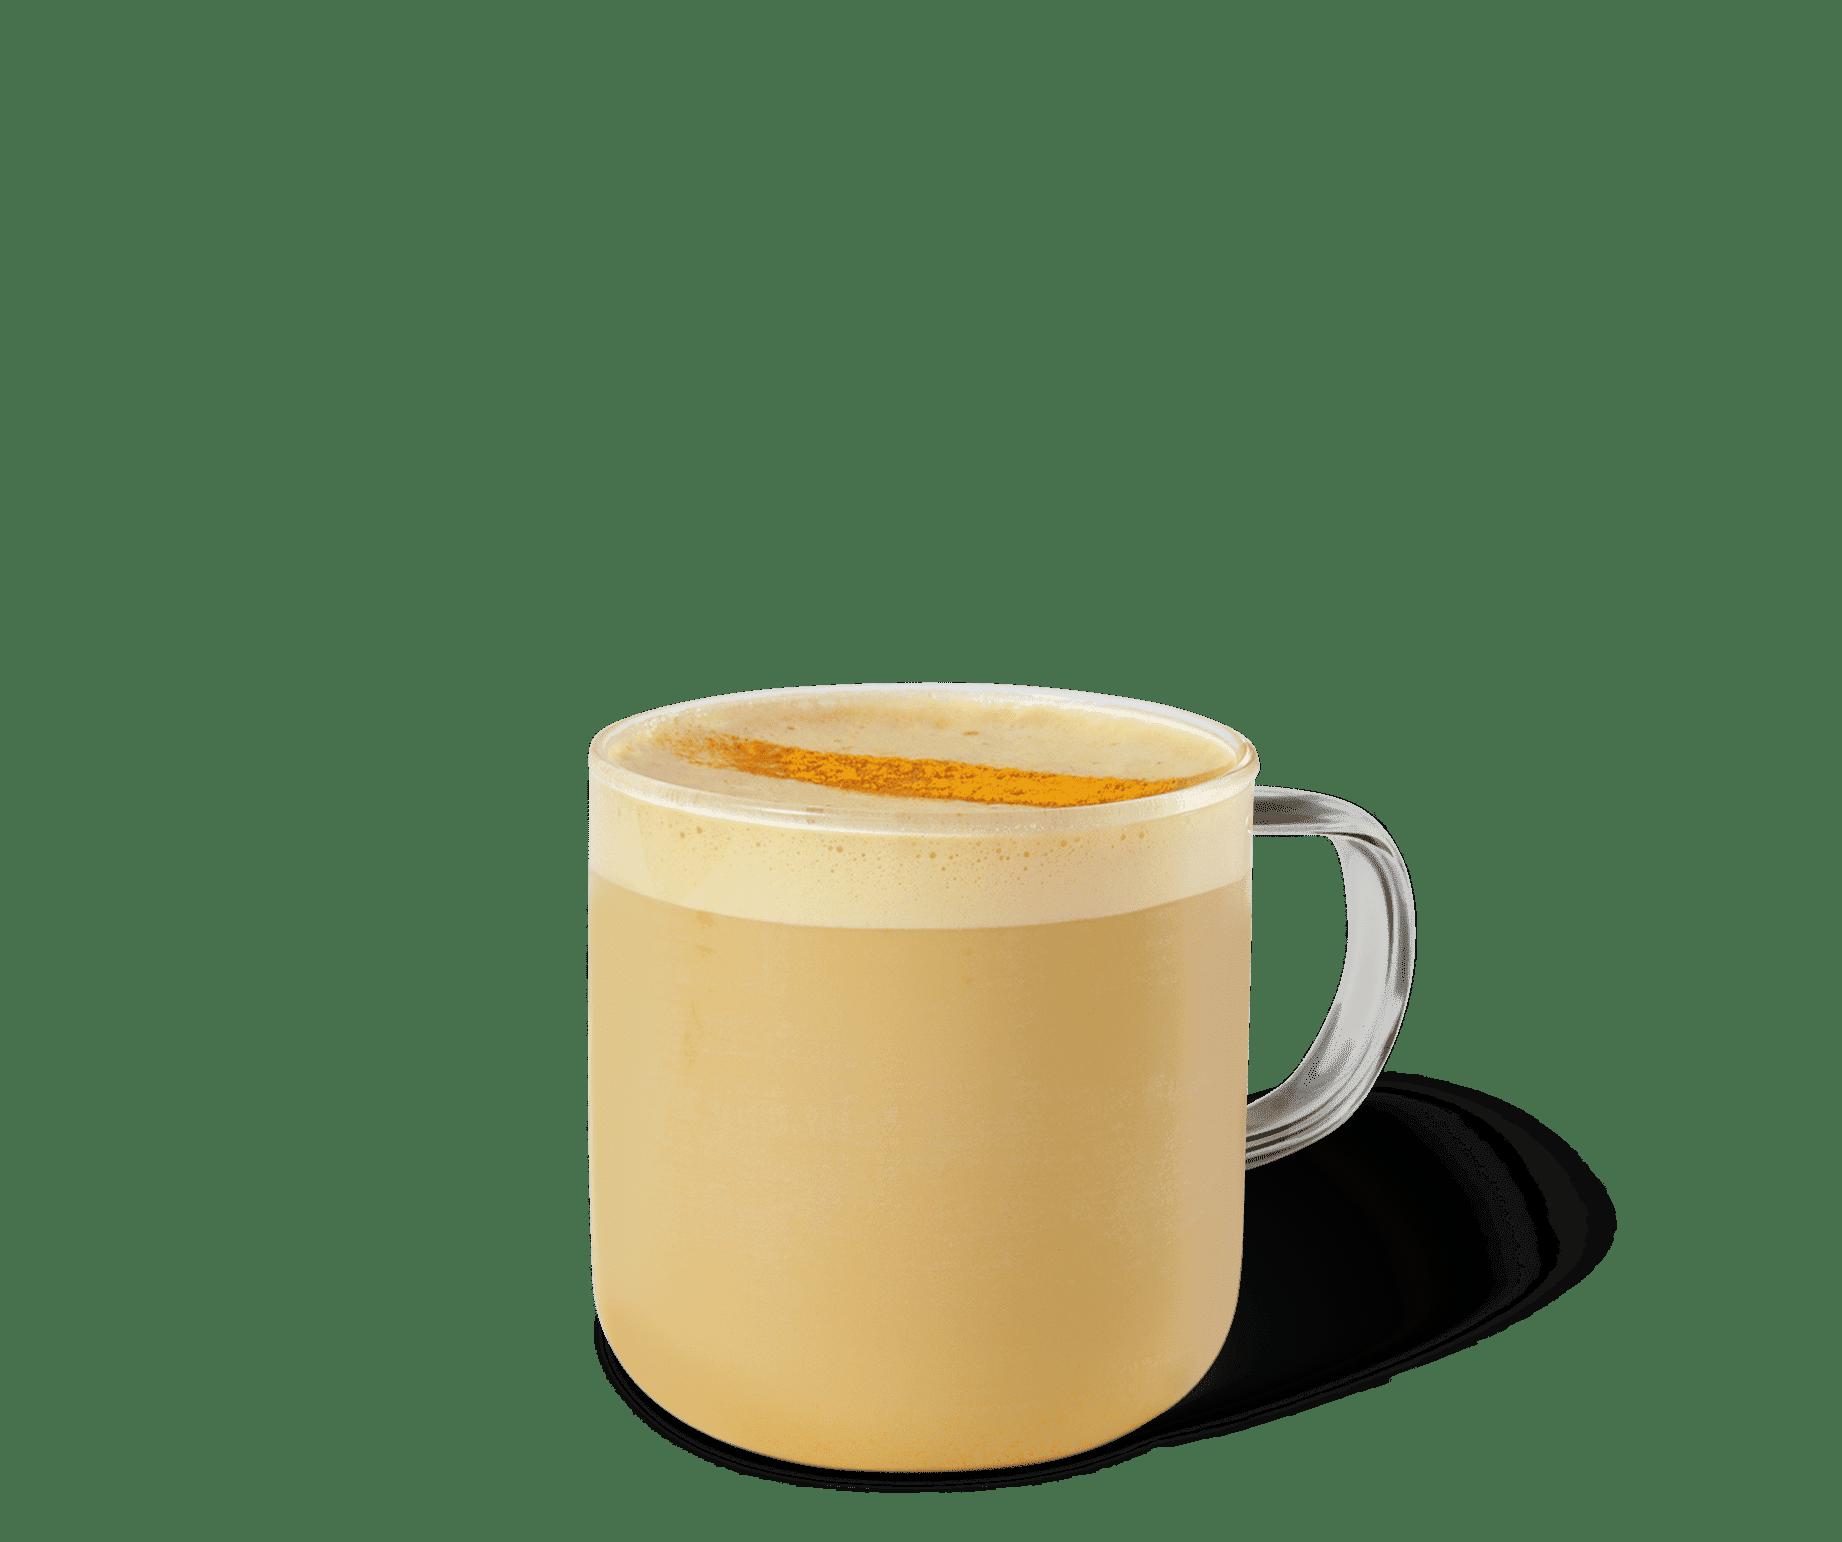 Tazza di Golden Tumeric latte Starbucks_ricette1